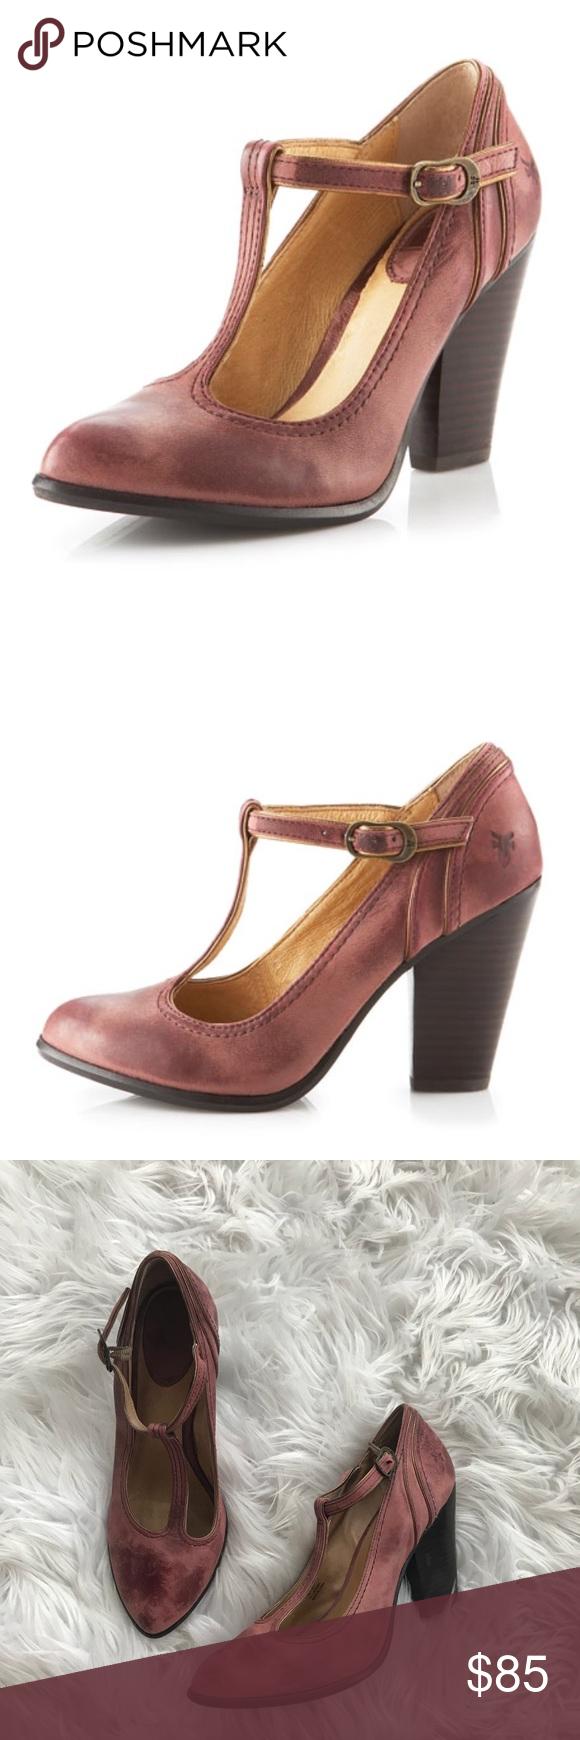 1442afc28baf Frye • Betty Ankle Strap Heels 10 Pink - Frye - Betty Ankle Strap Heels